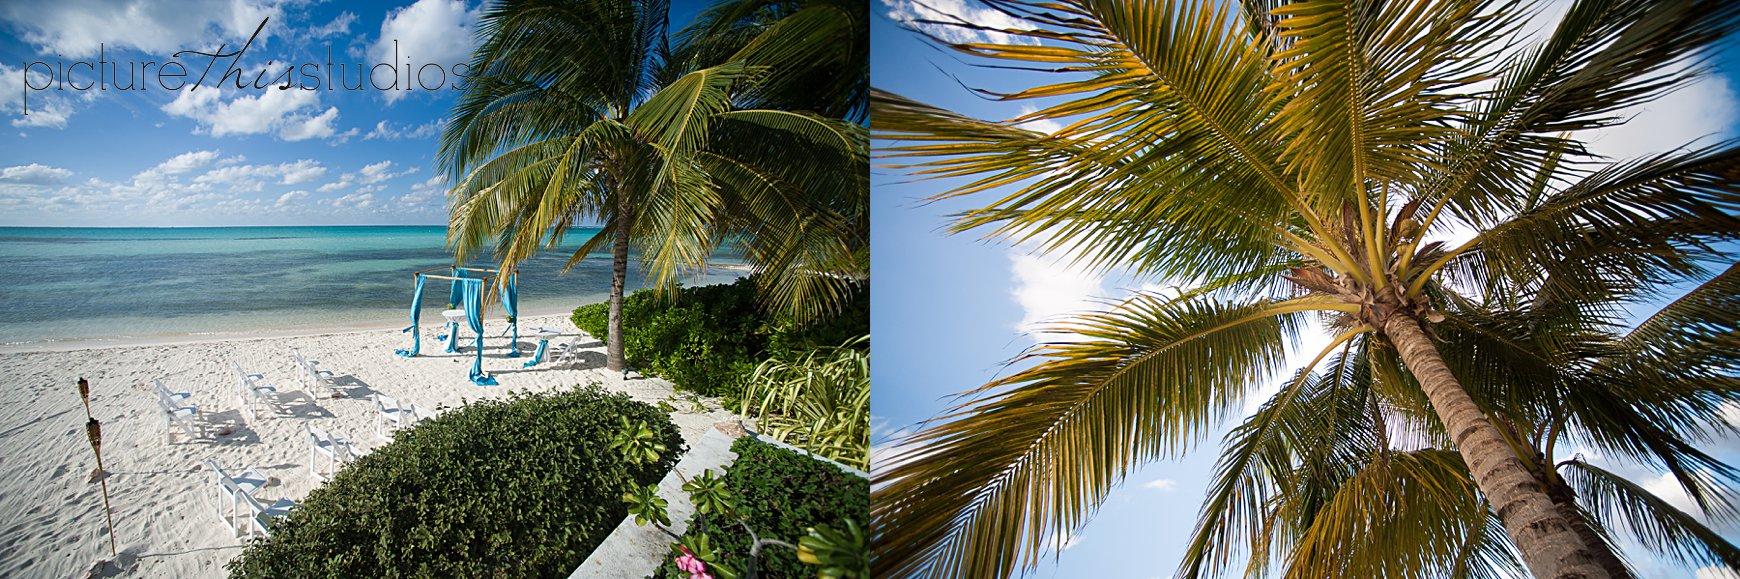 cayman islands wedding photographers_0001